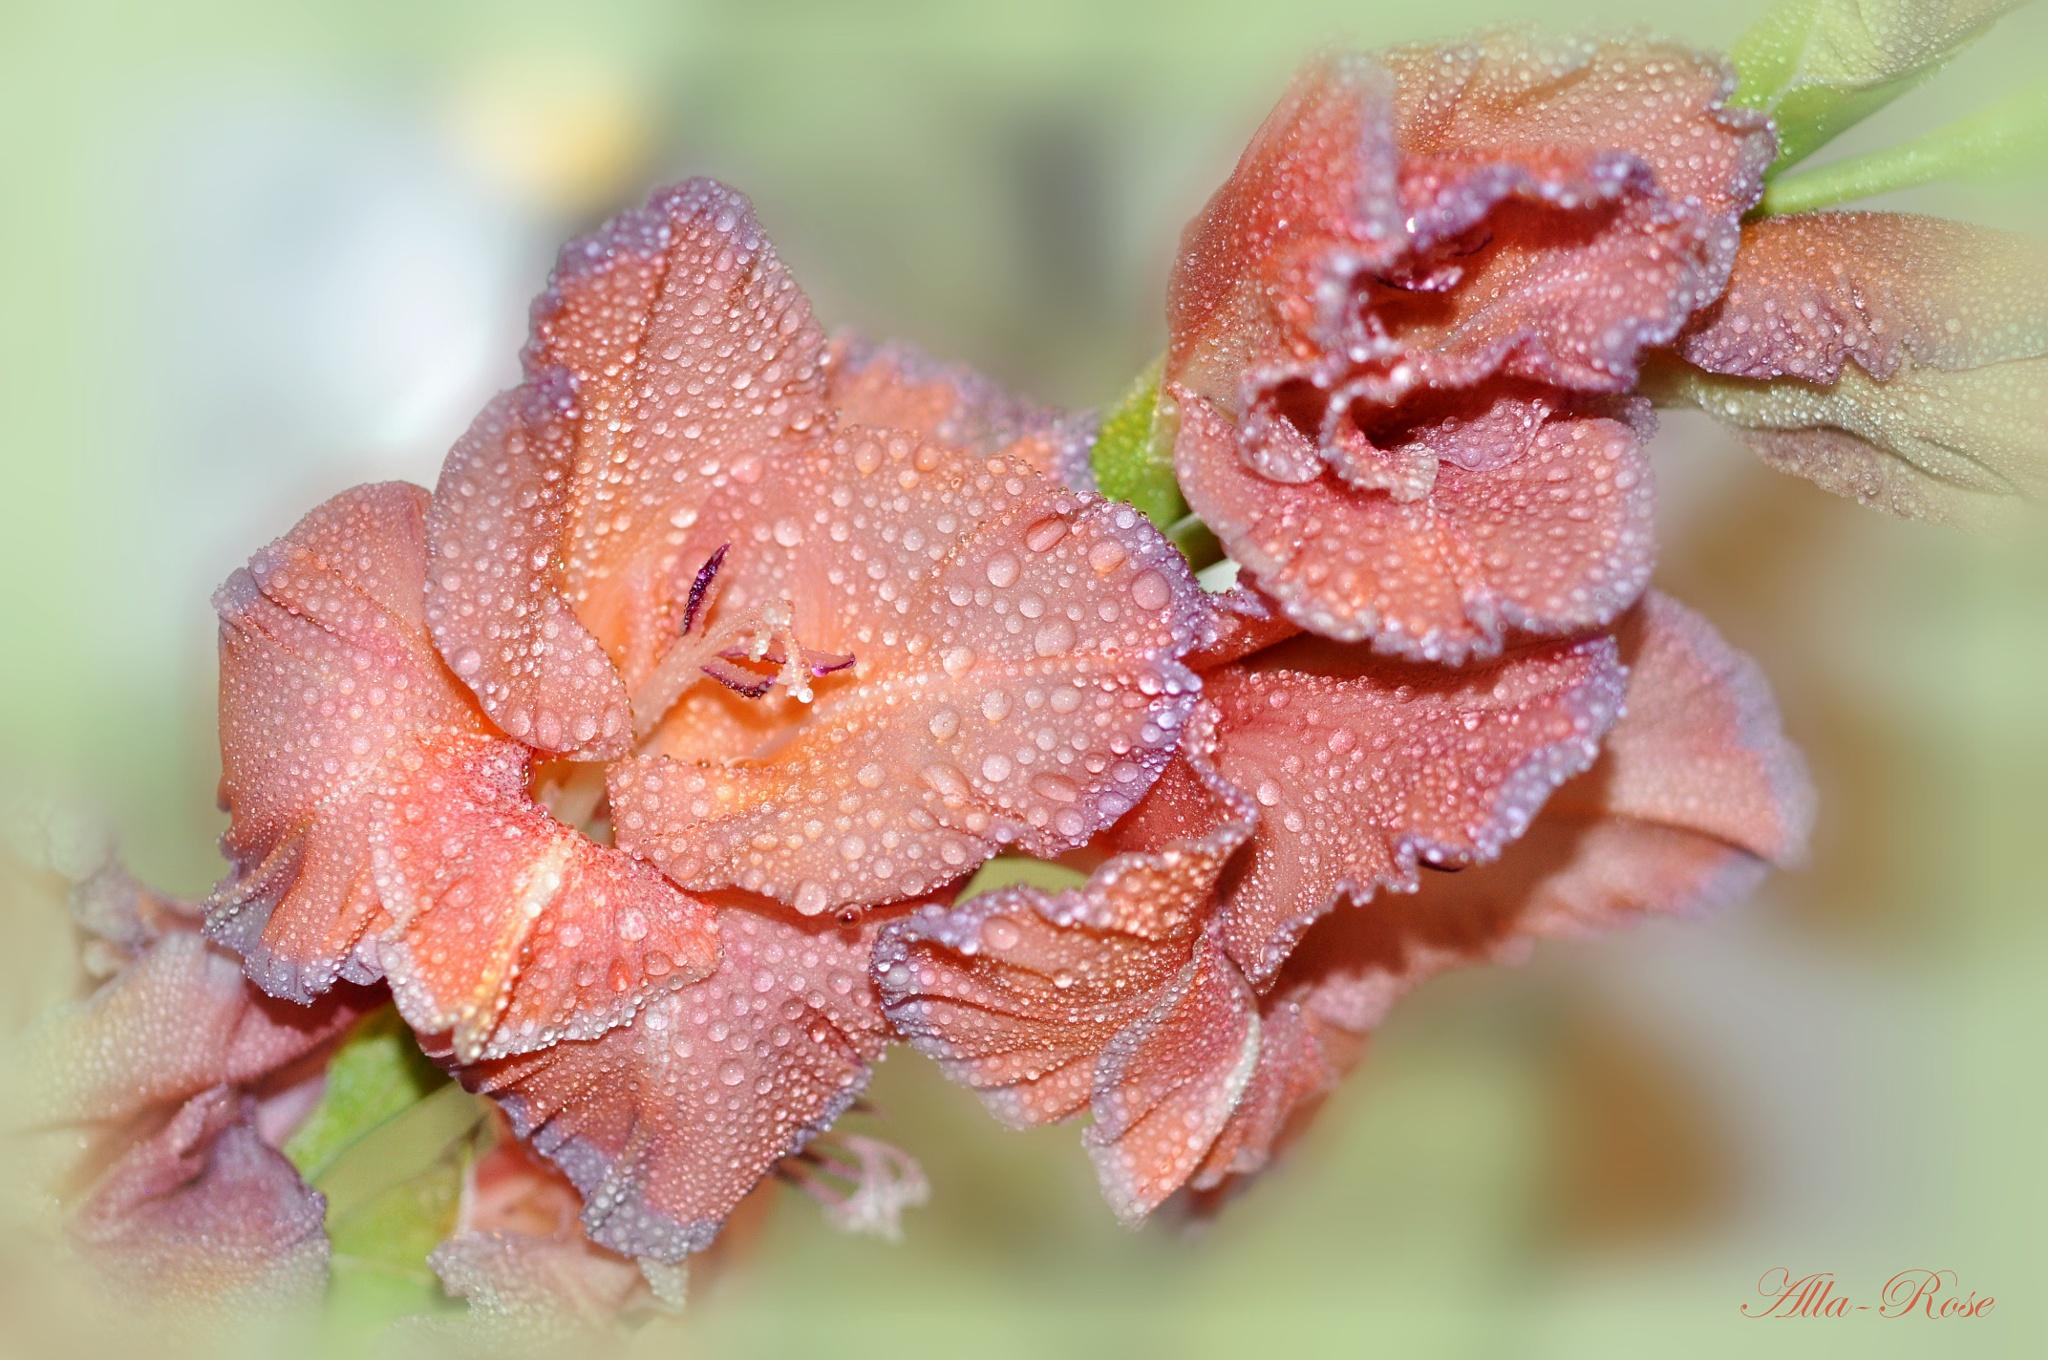 Gladiolus drops by Alla-Rose